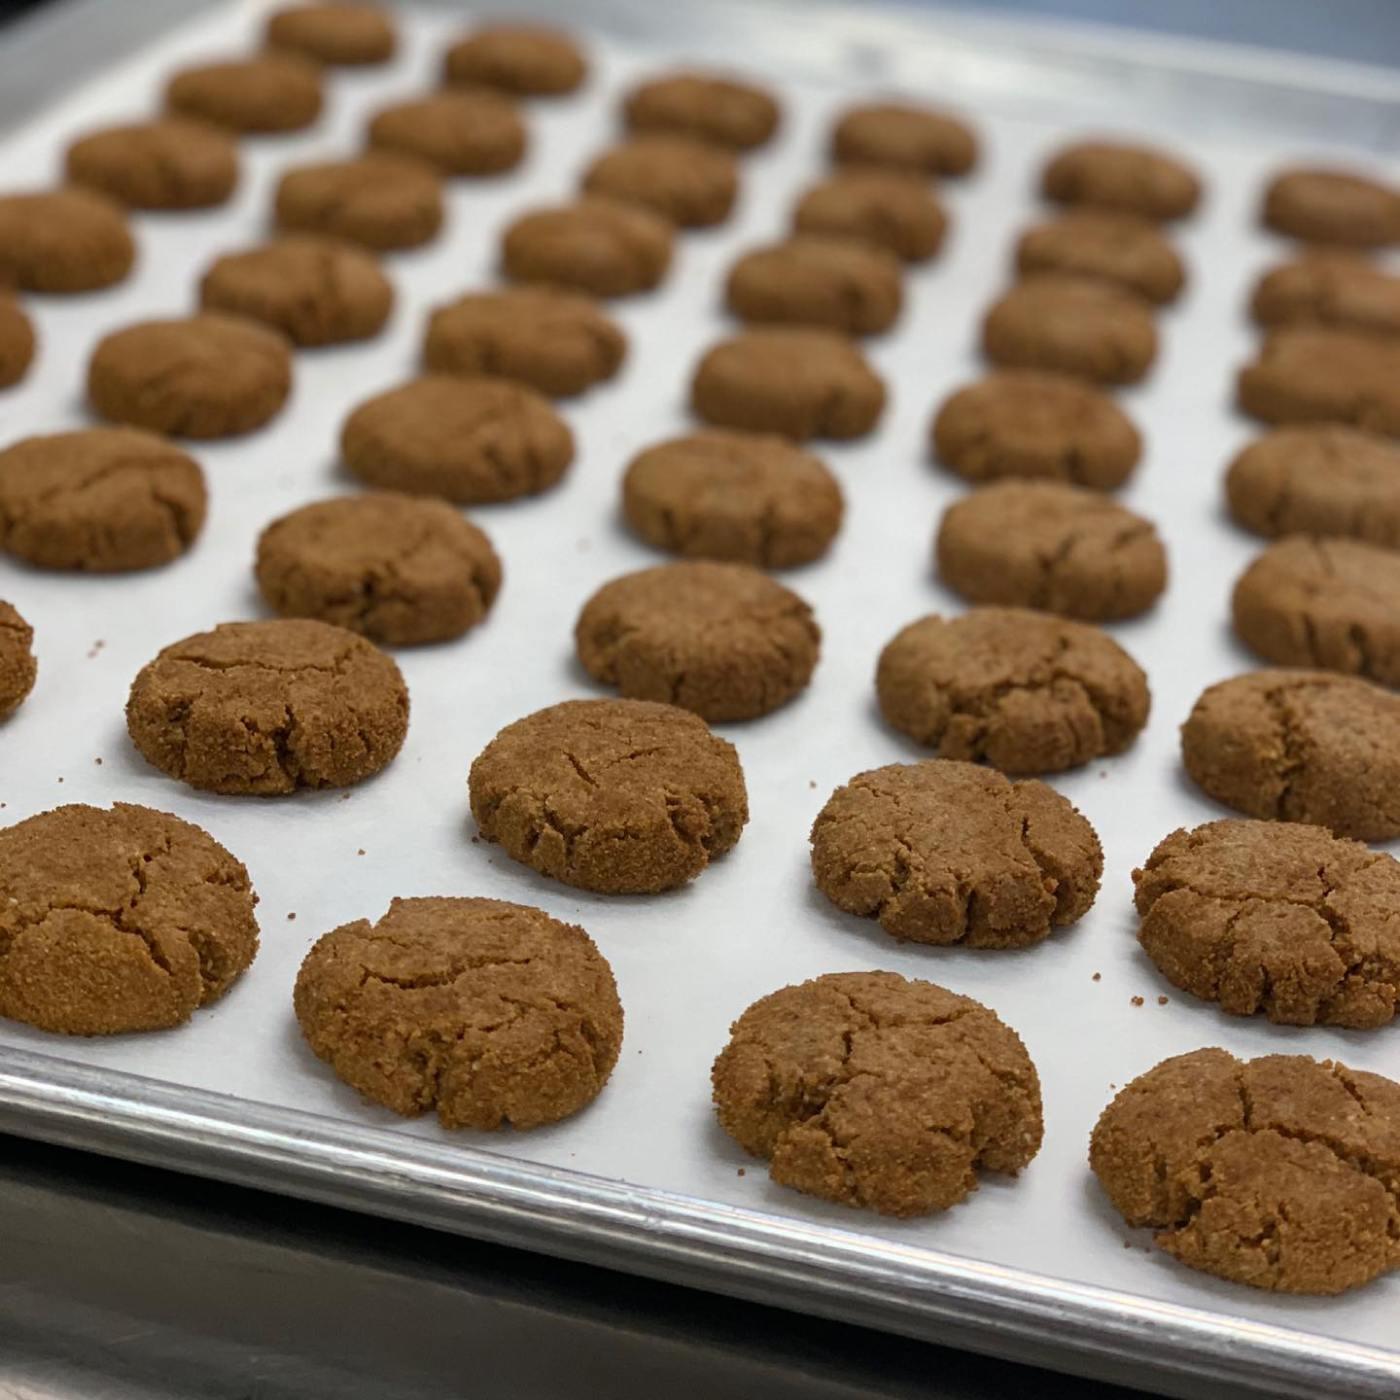 The Joyful Food Co. ginger snaps